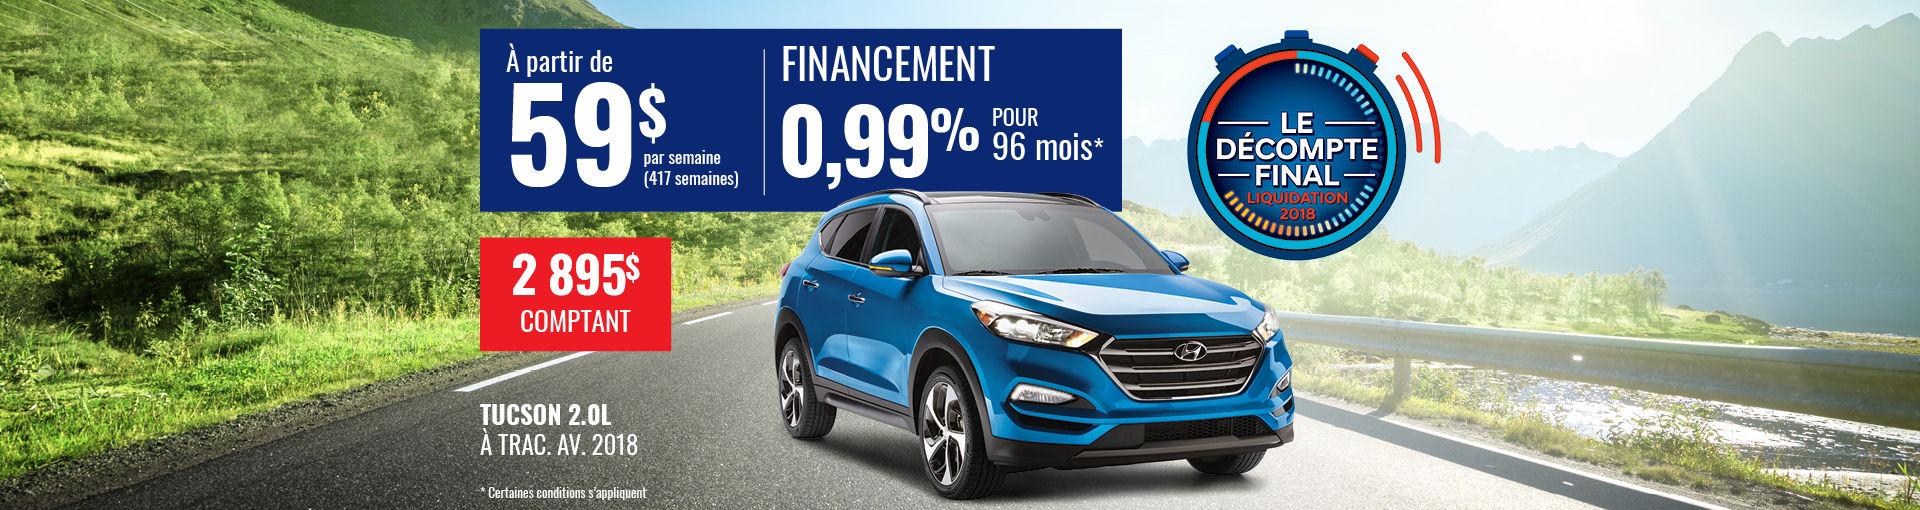 Promo Hyundai Casavant août 2018-Tucson 2018 pc